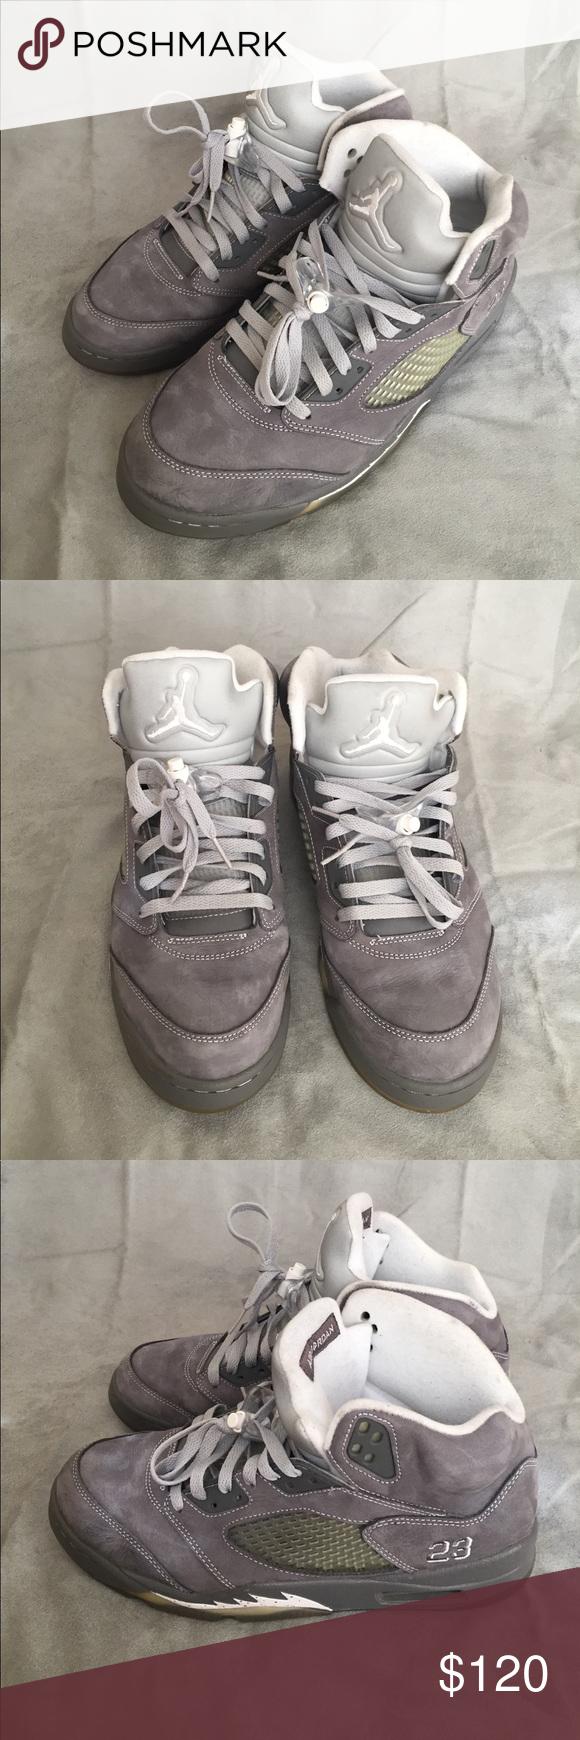 best sneakers 117cd 48dae Nike Air Jordan 5 Retro Size 10 136027 005 Grey Great condition Nike Air  Jordan 5 Retro size 10 sneakers. Light graphite White-Wolf Grey. 136027 005.